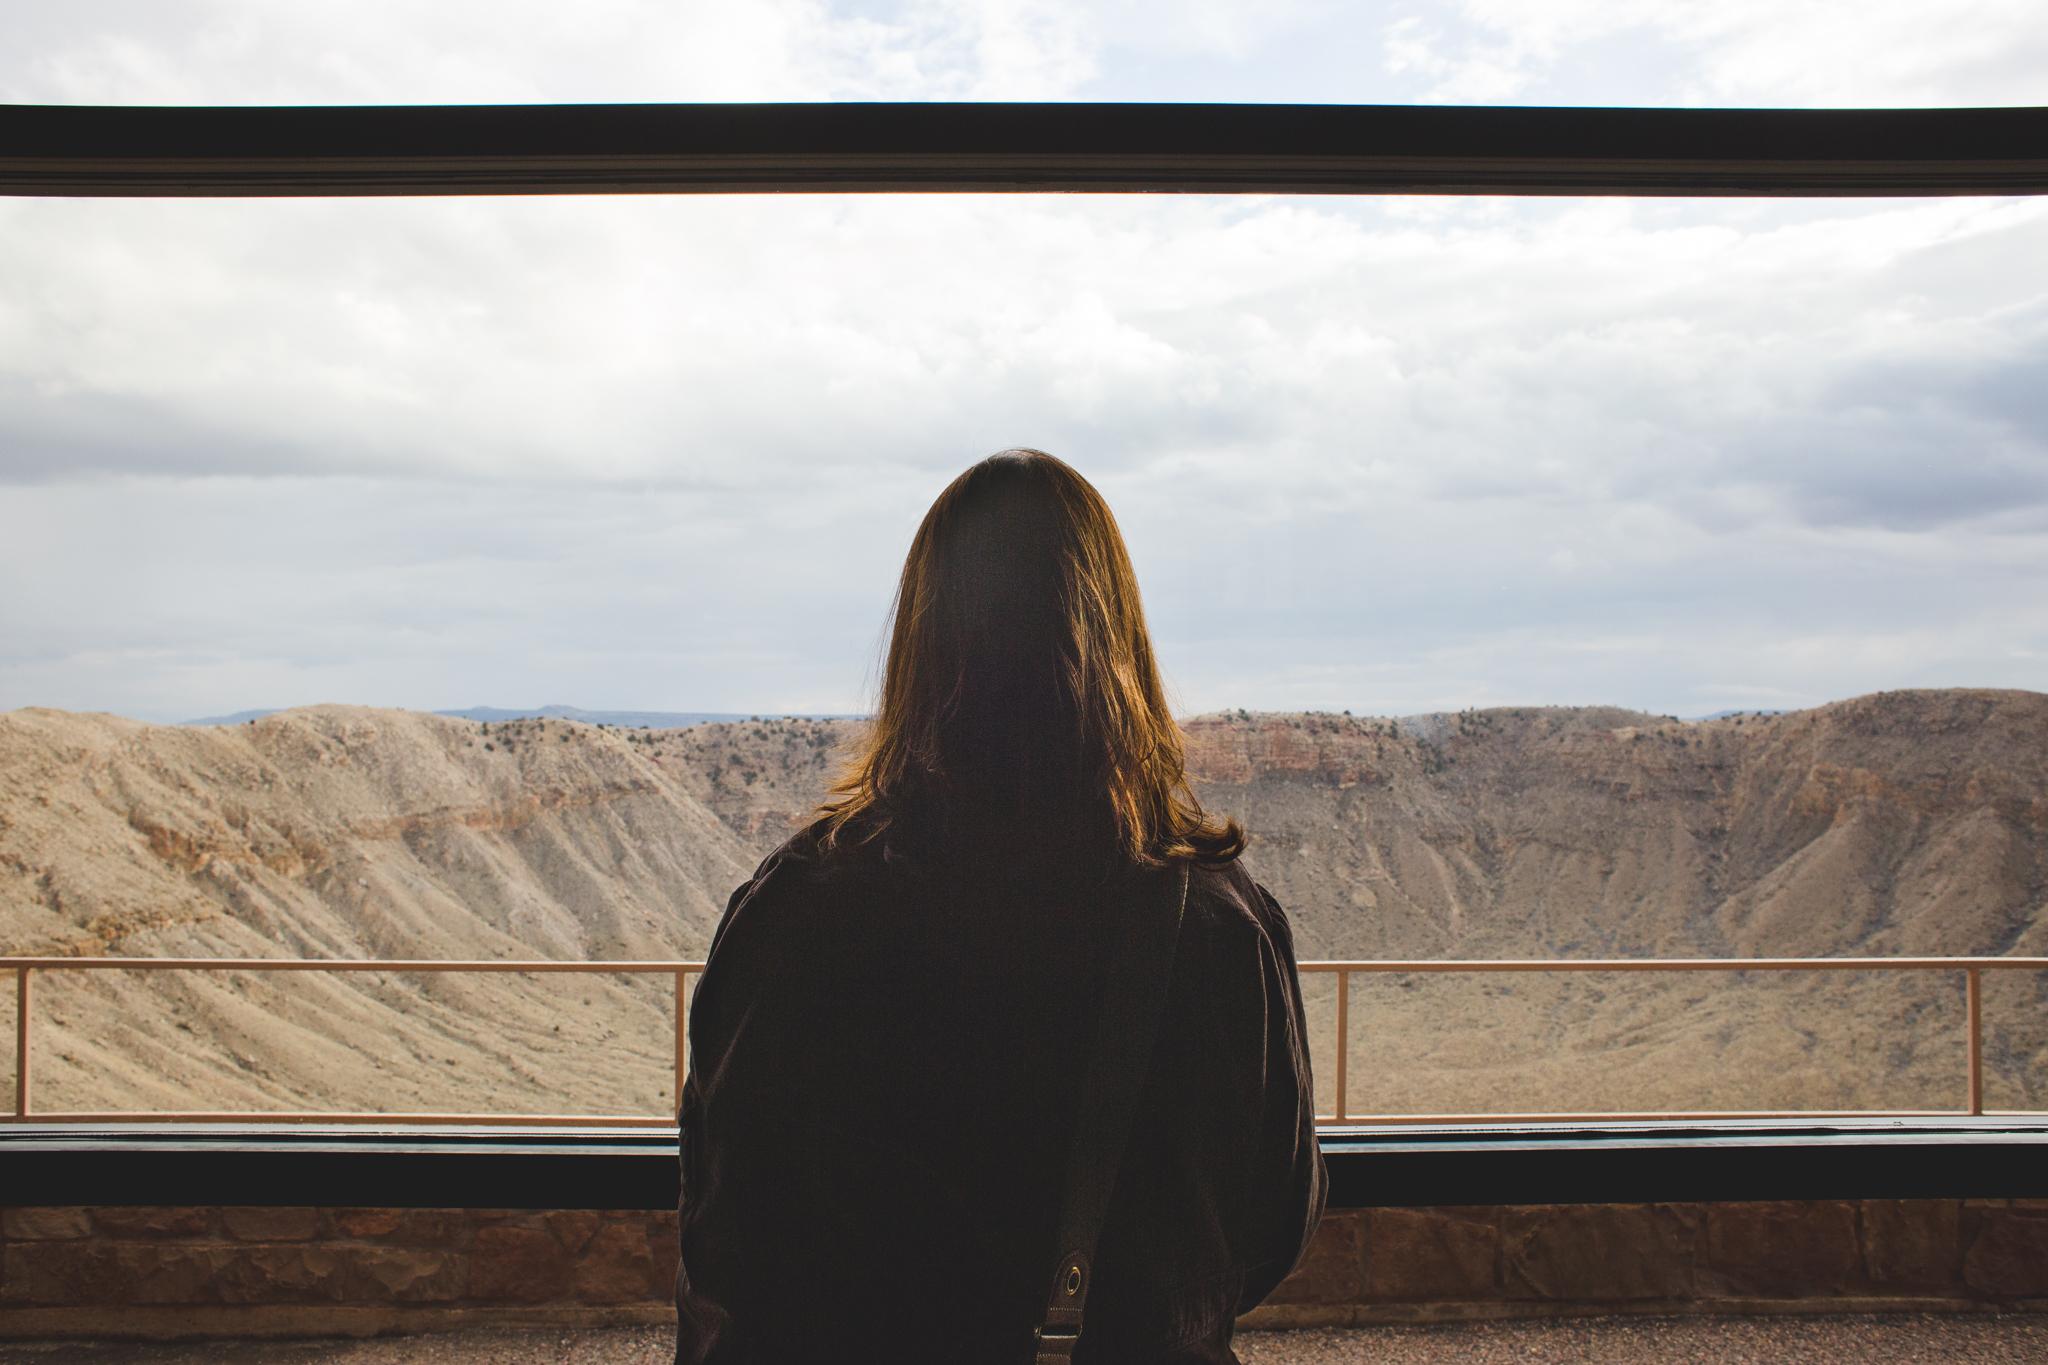 katie looking out window meteor crater